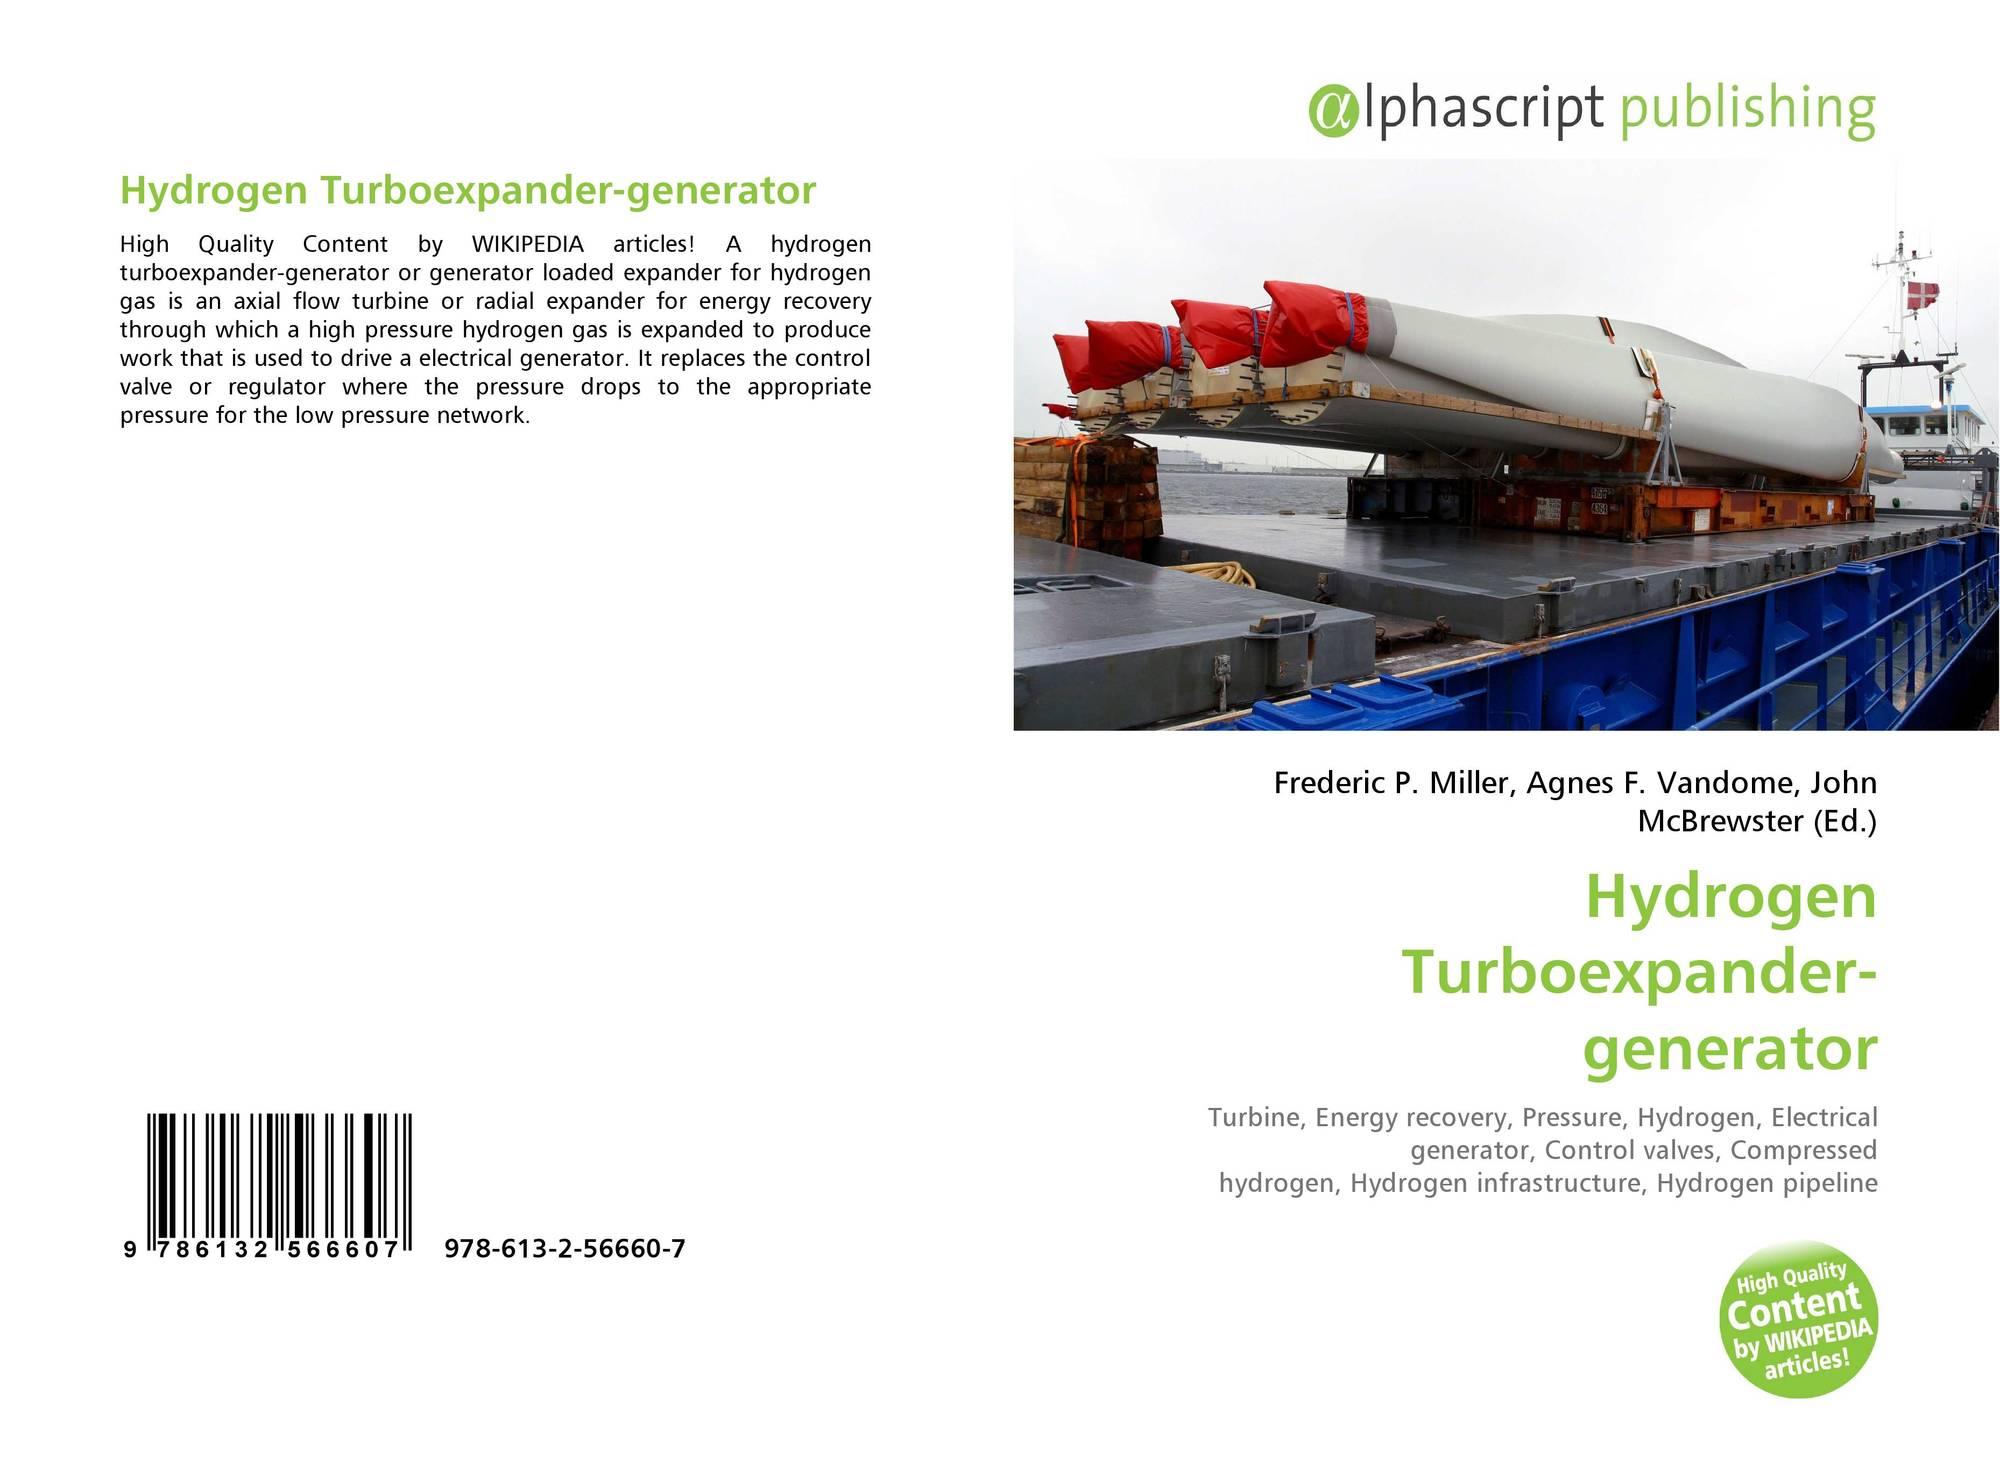 Hydrogen Turboexpander-generator, 978-613-2-56660-7, 6132566600